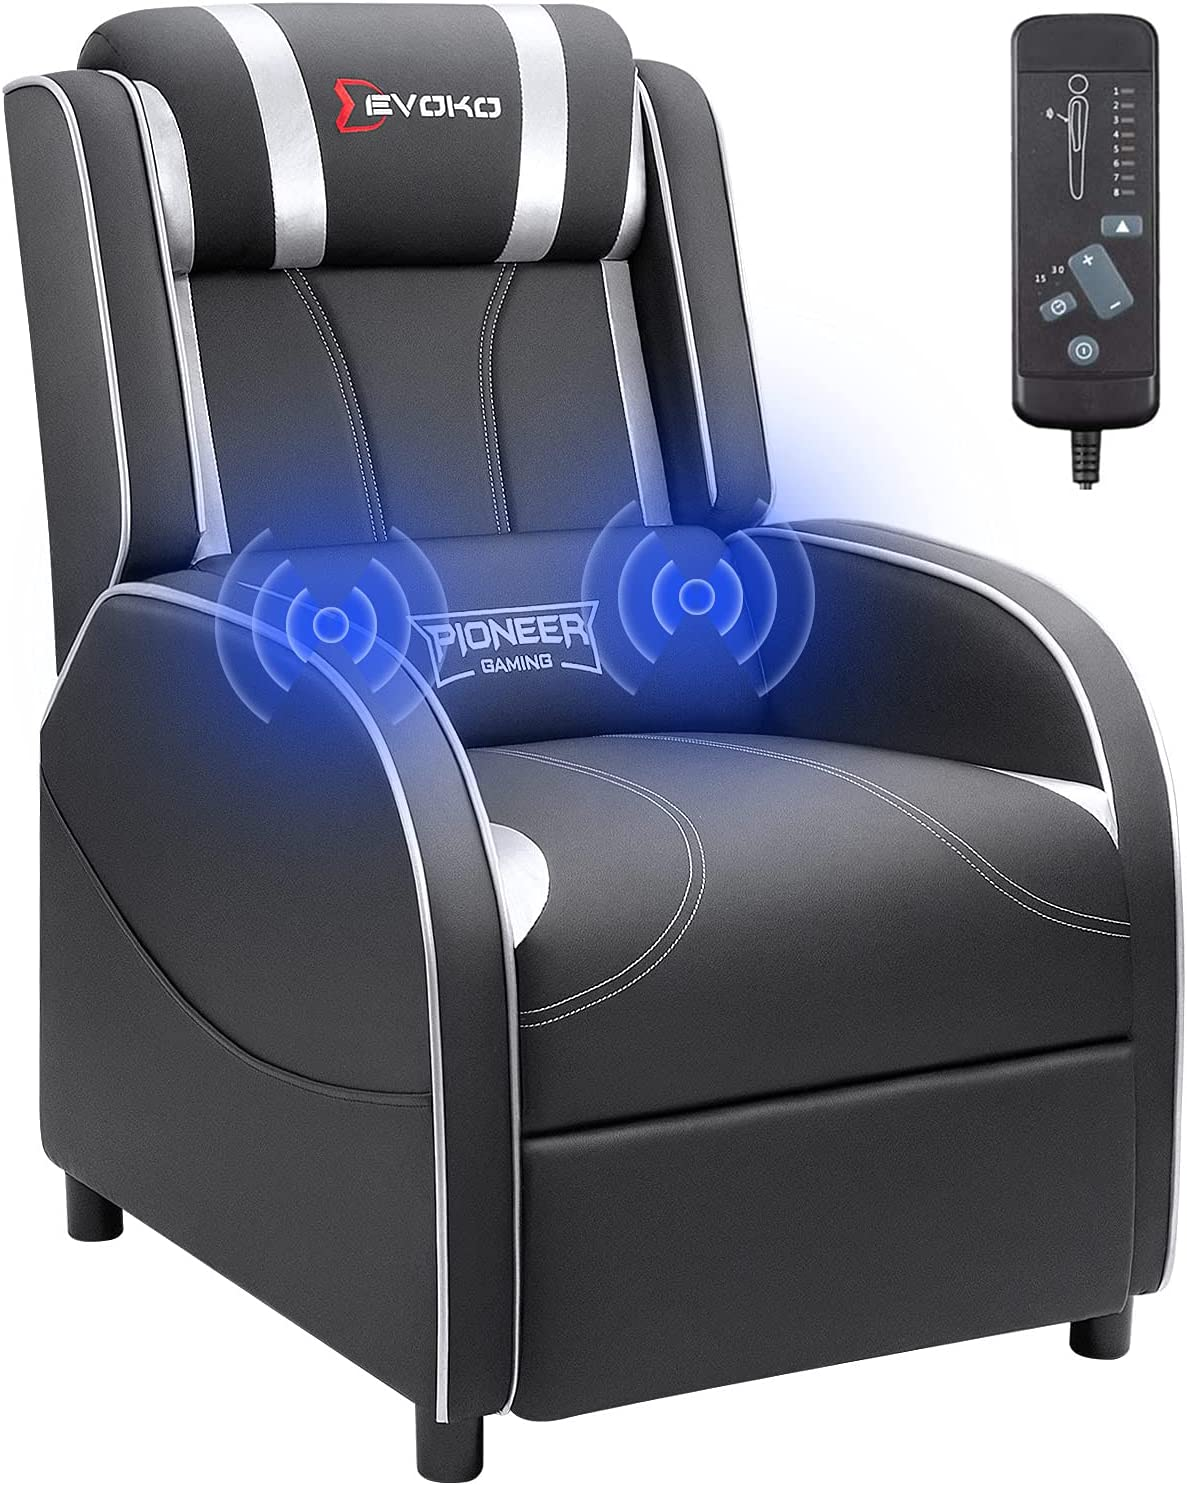 Devoko Massage Gaming Recliner Chair Sea PU Theater Home Leather Bombing free shipping Superlatite